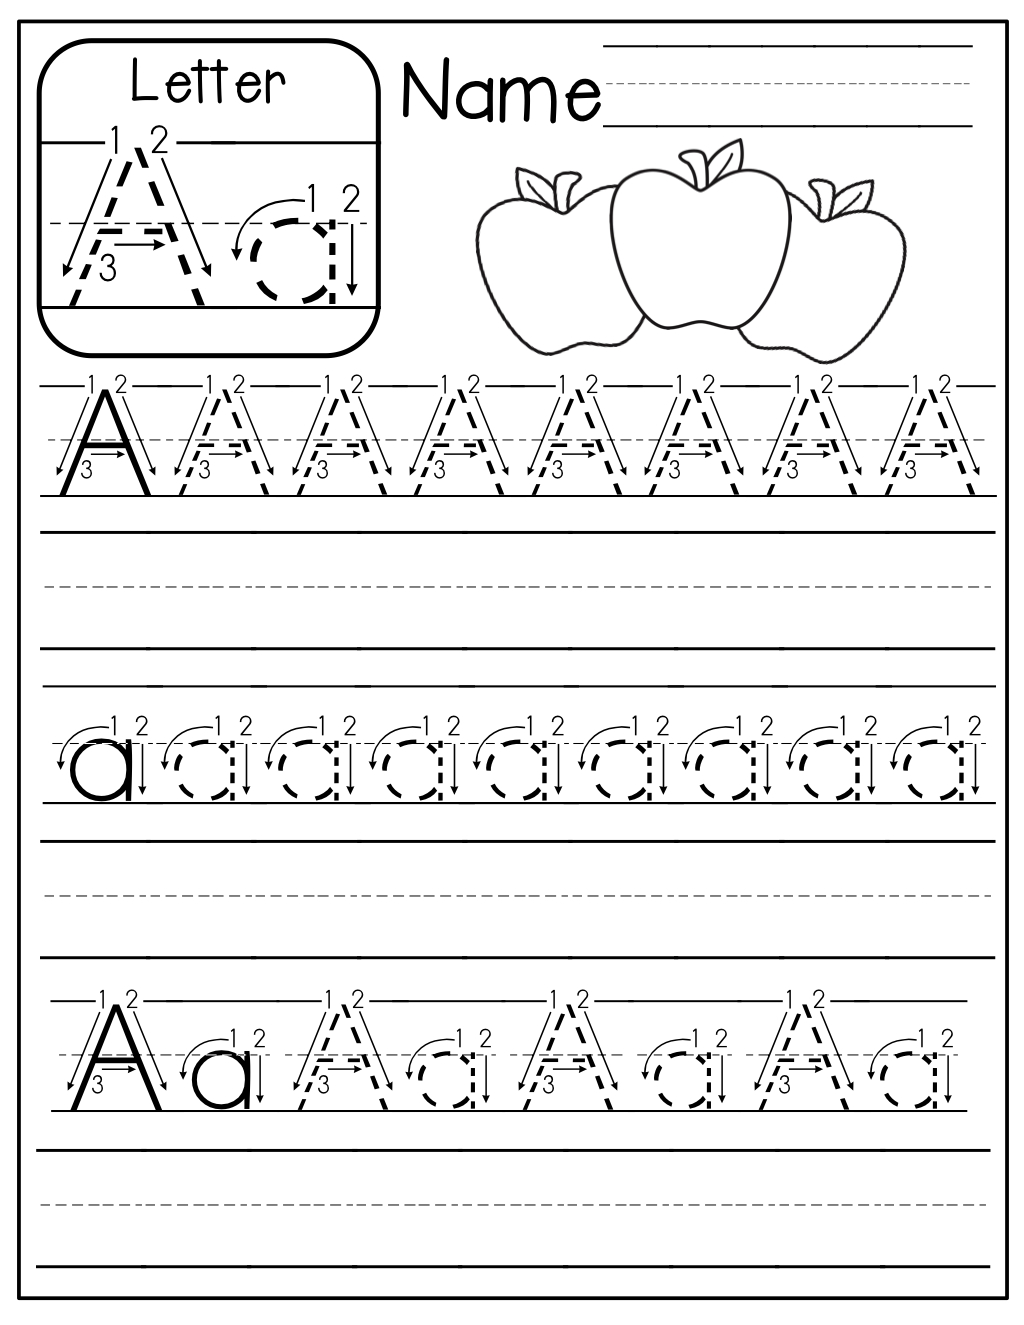 Freebie: A-Z Handwriting Practice Pages! | Kindergarten regarding Letter W Tracing Paper